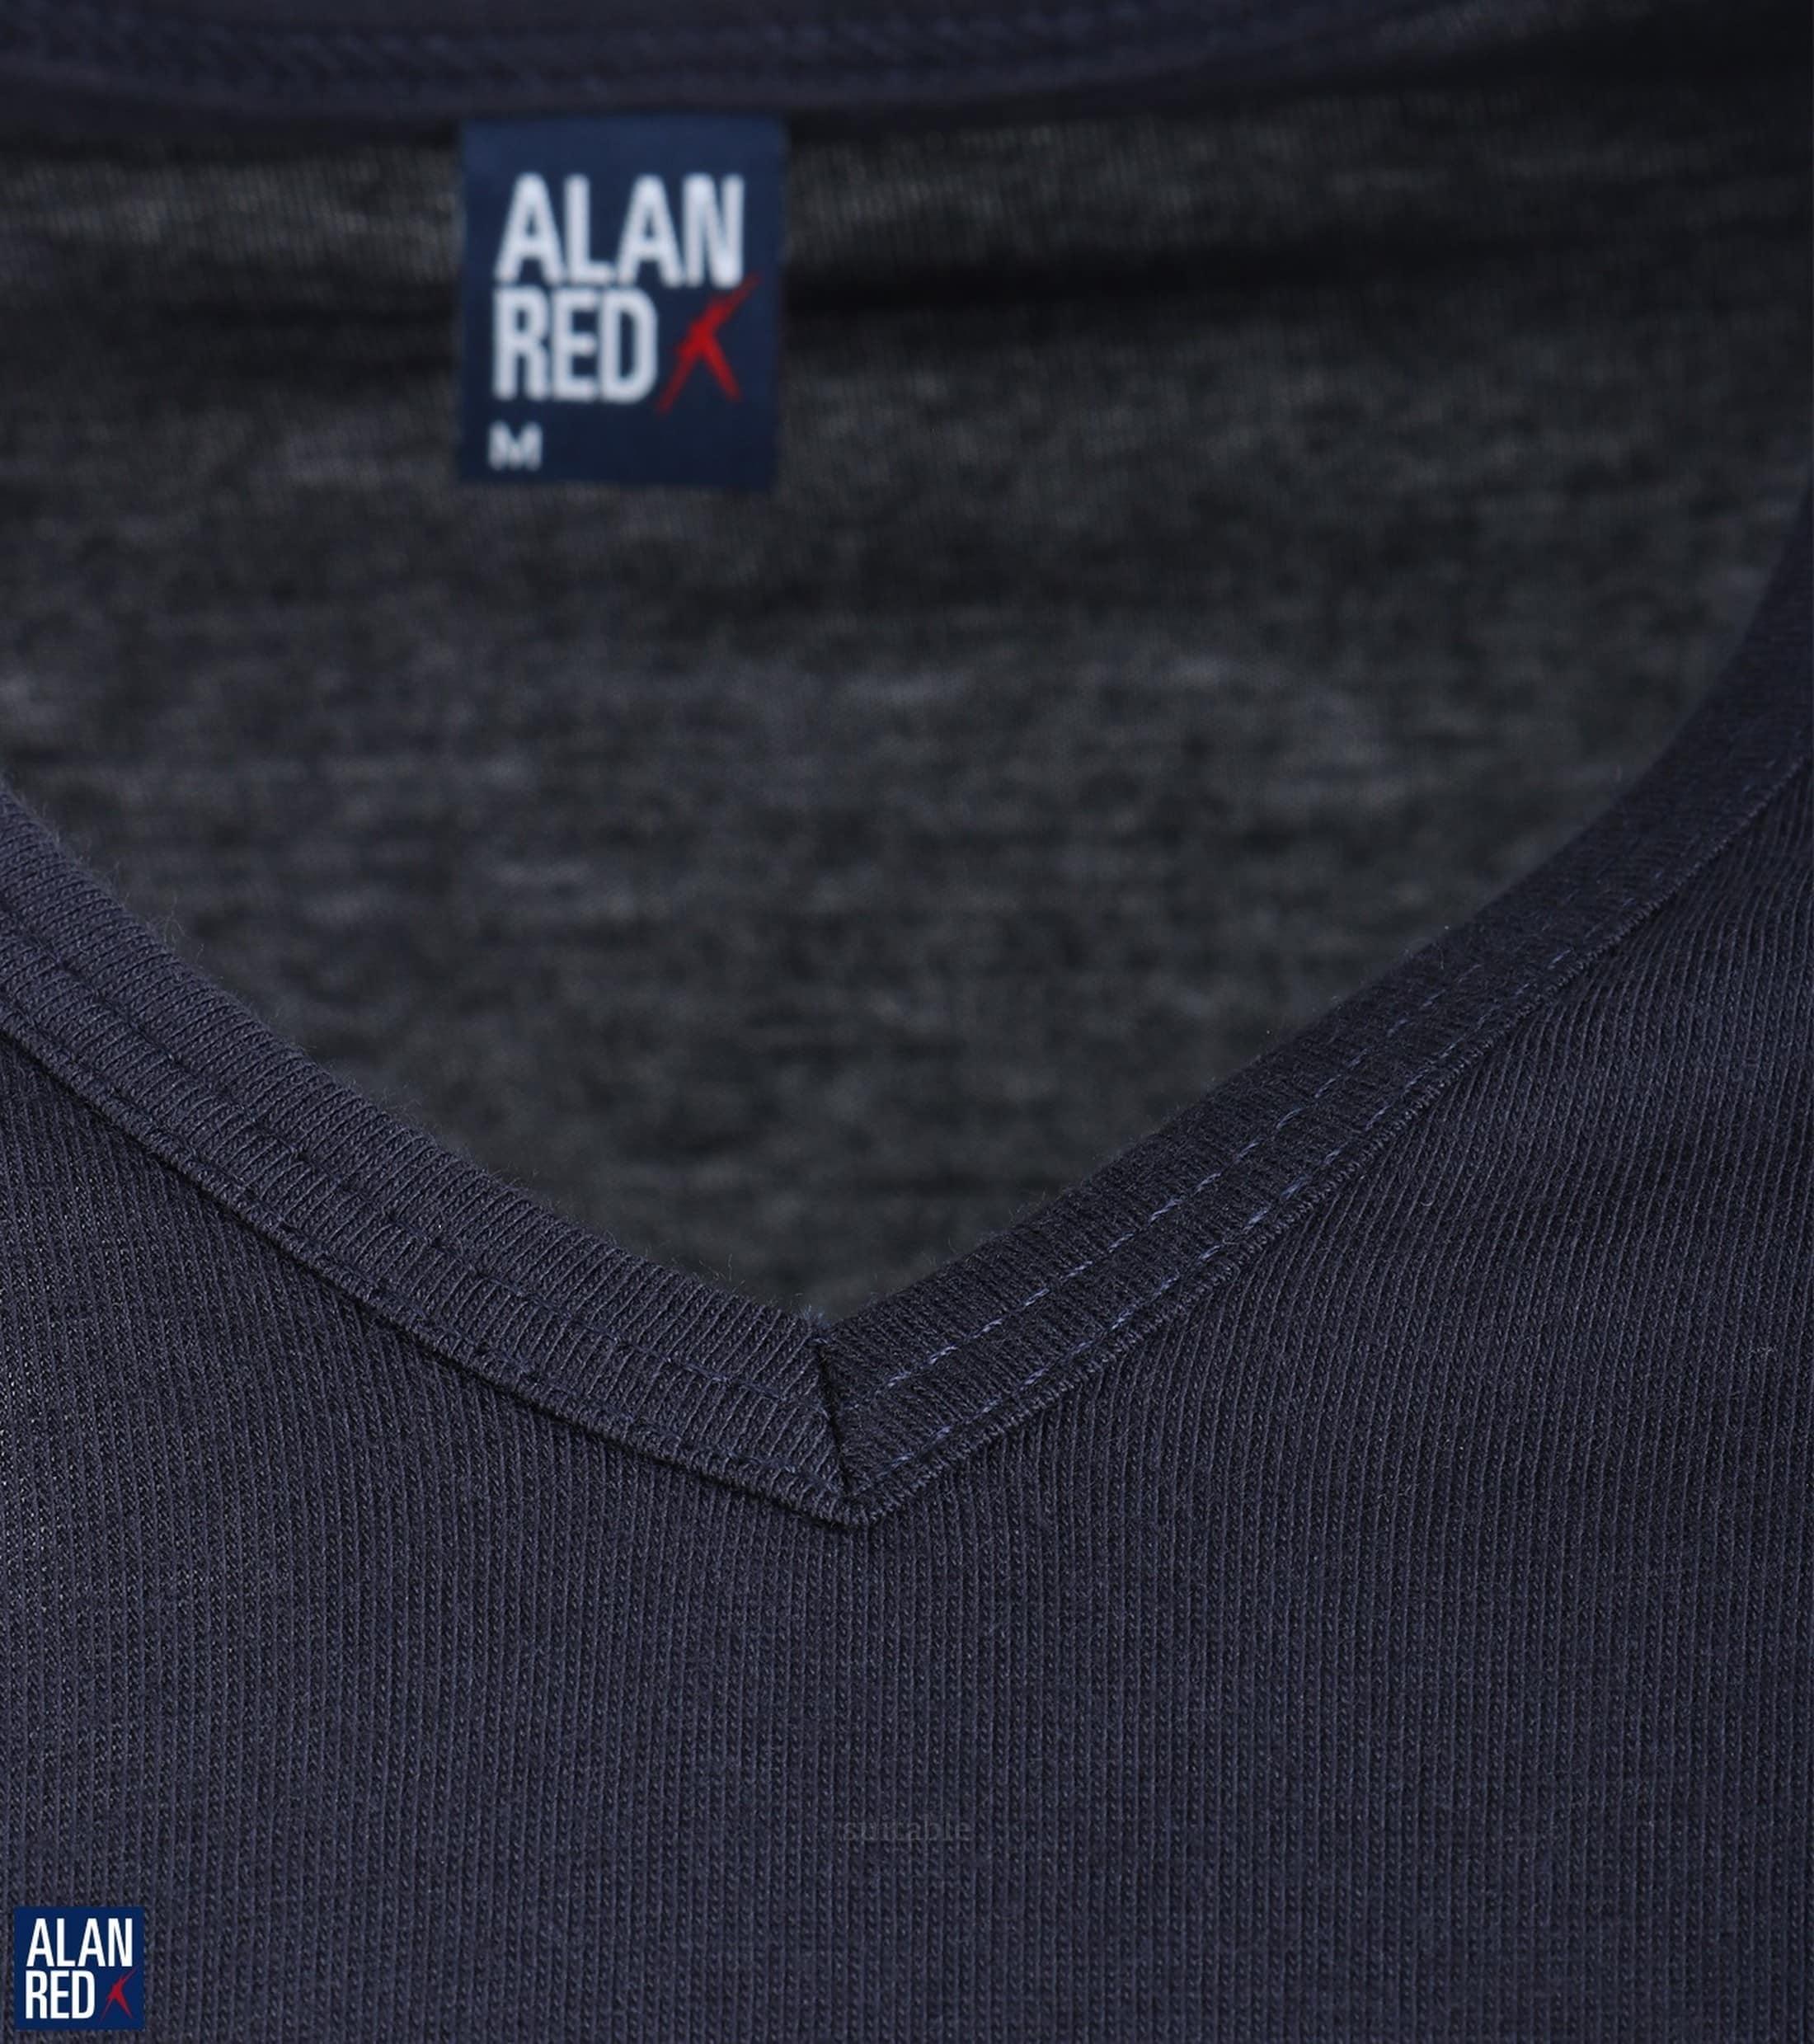 Alan Red Vermont T-shirt V-Neck Navy 1-Pack foto 2